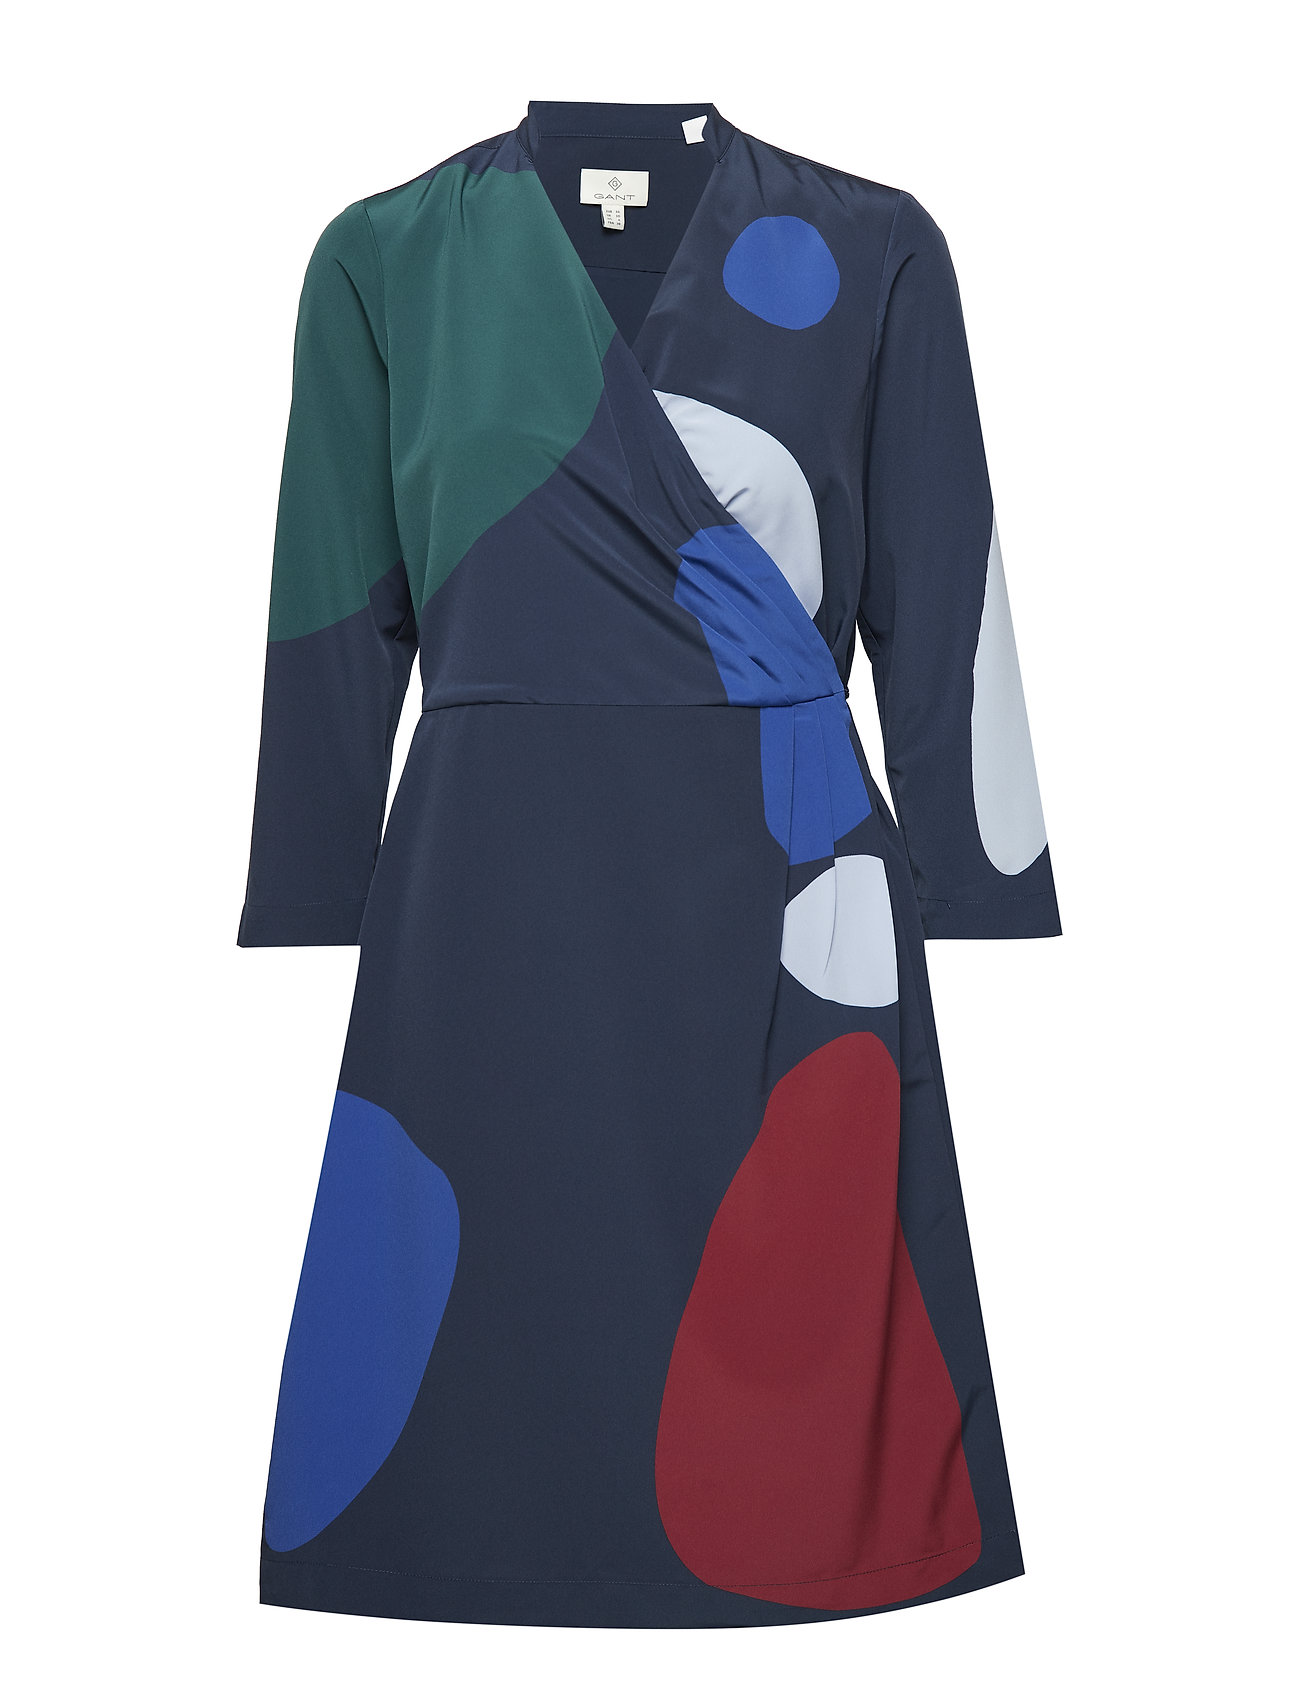 GANT G1. MOBILIZE WRAP DRESS - MARINE